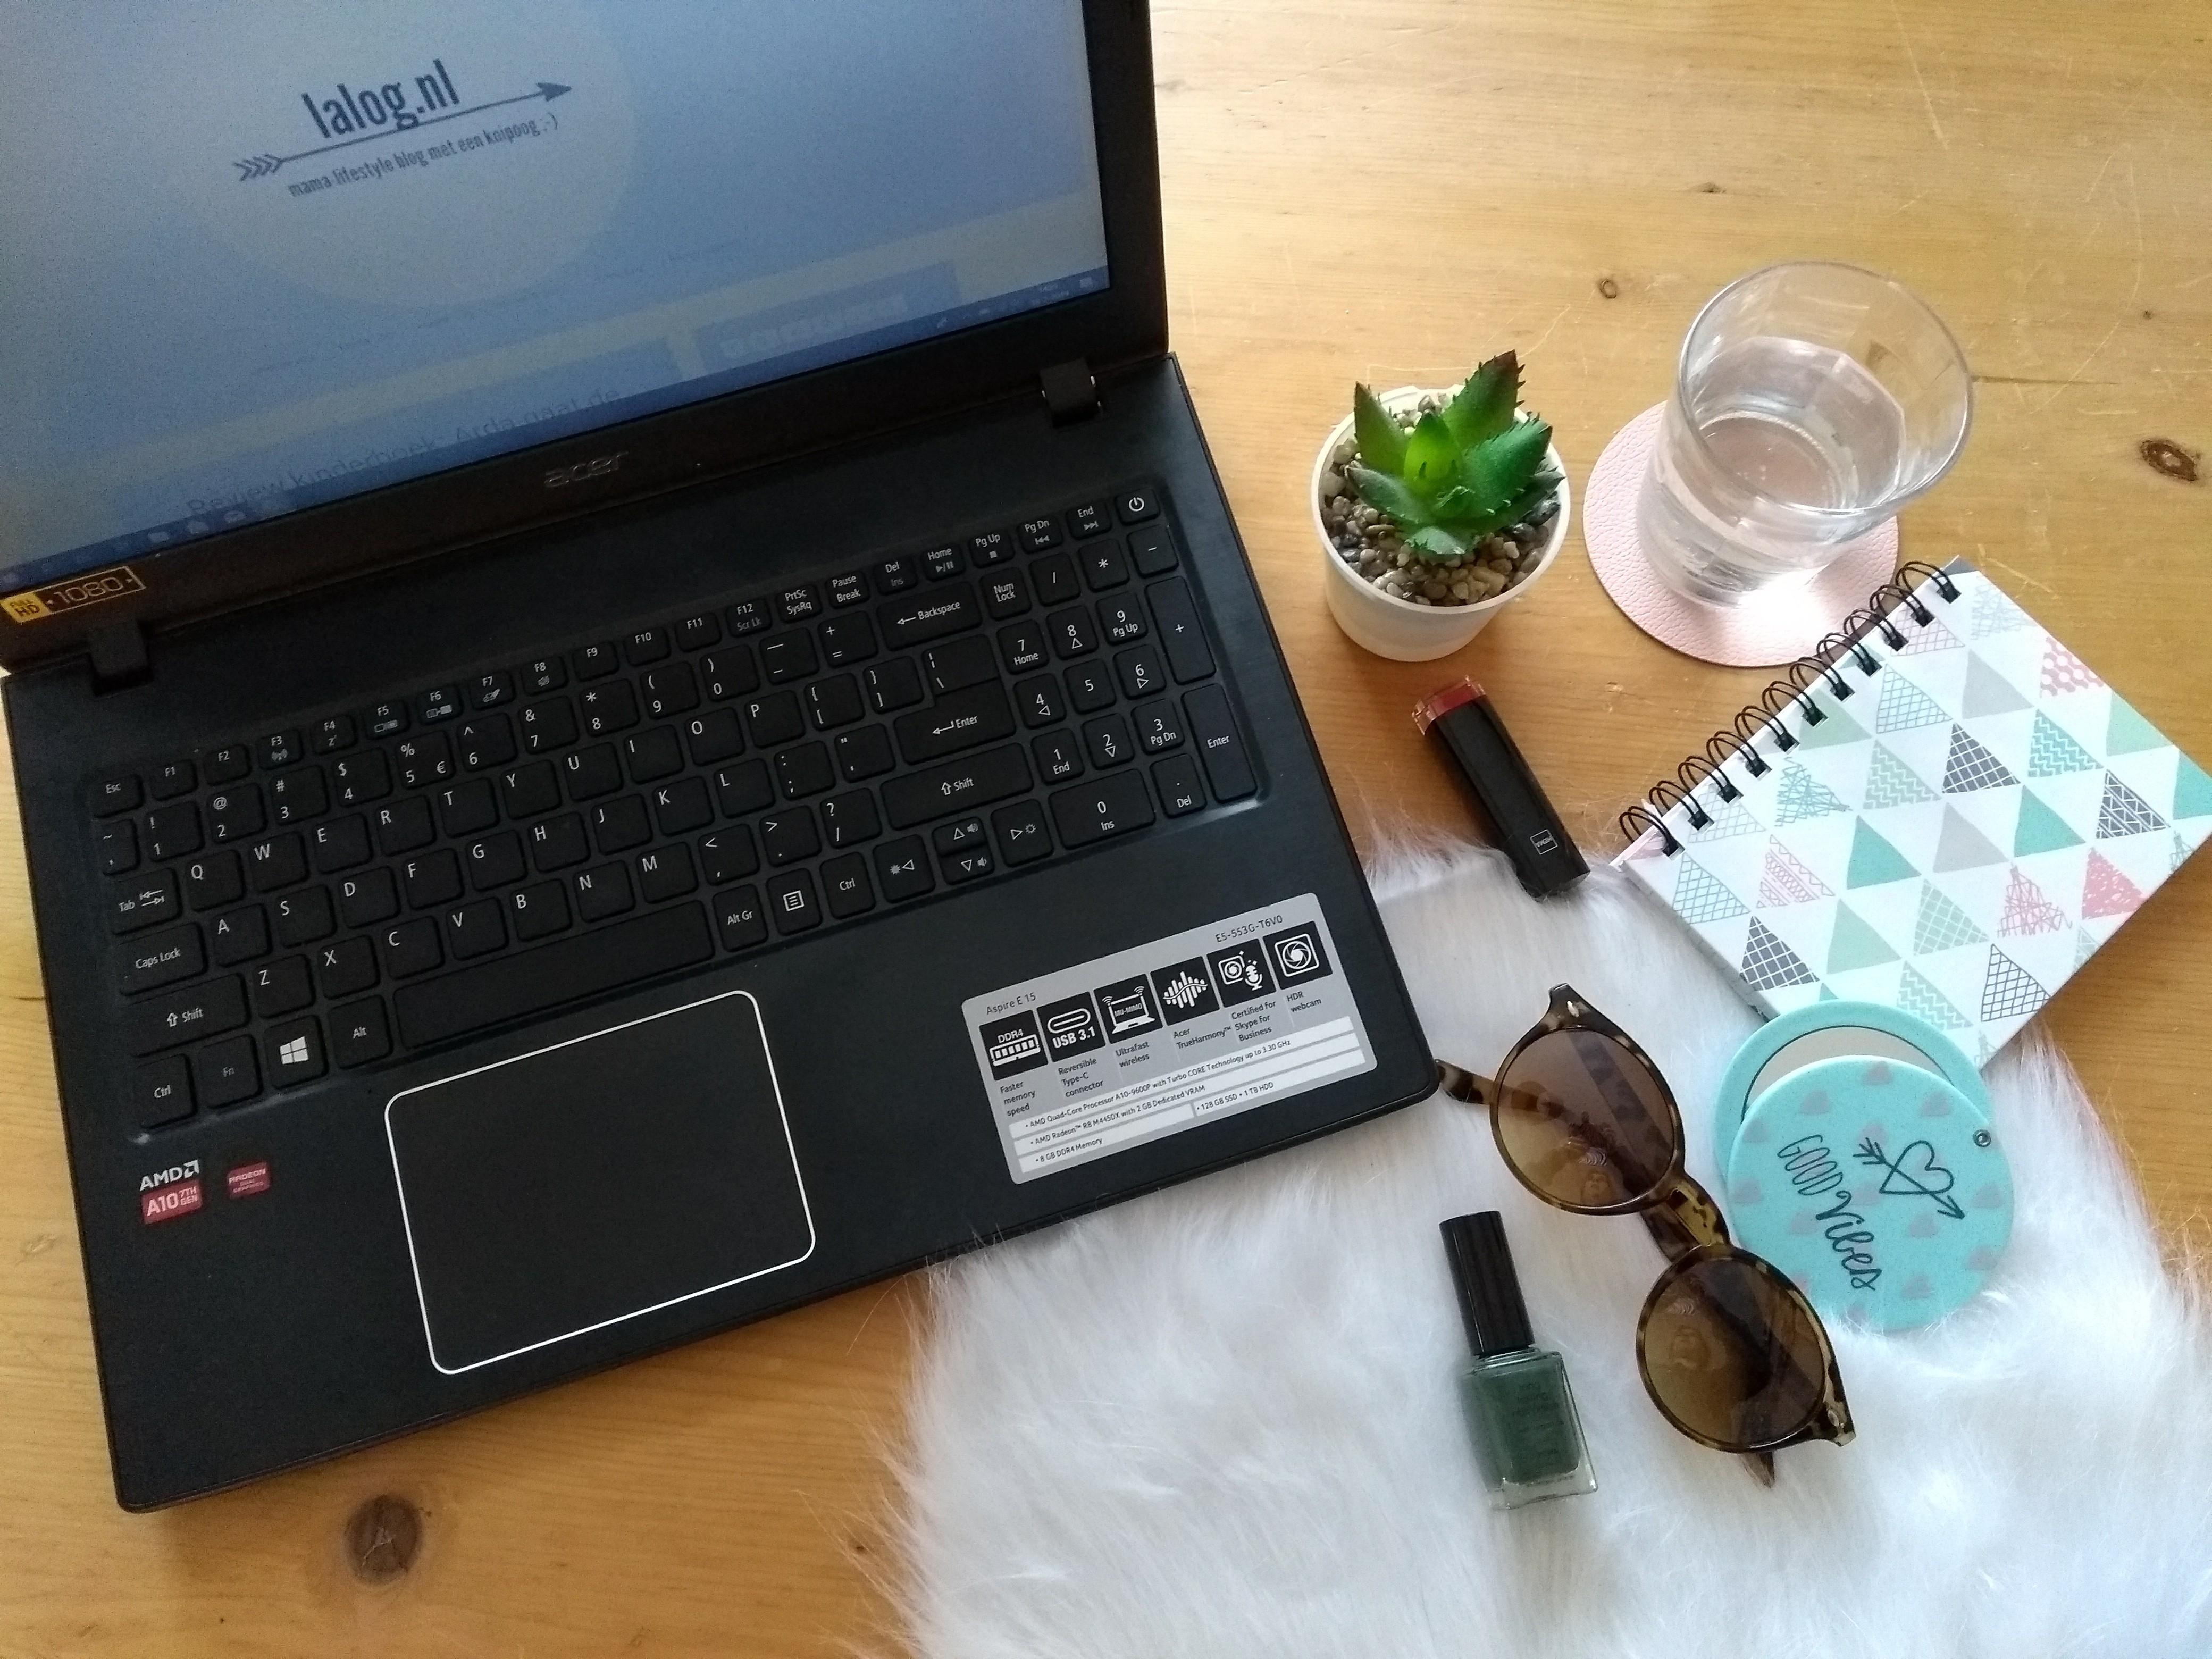 lalog.nl, flatlay, laptop, blog, mamablog, bloggen, mamalifestyleblog, lalog.nl